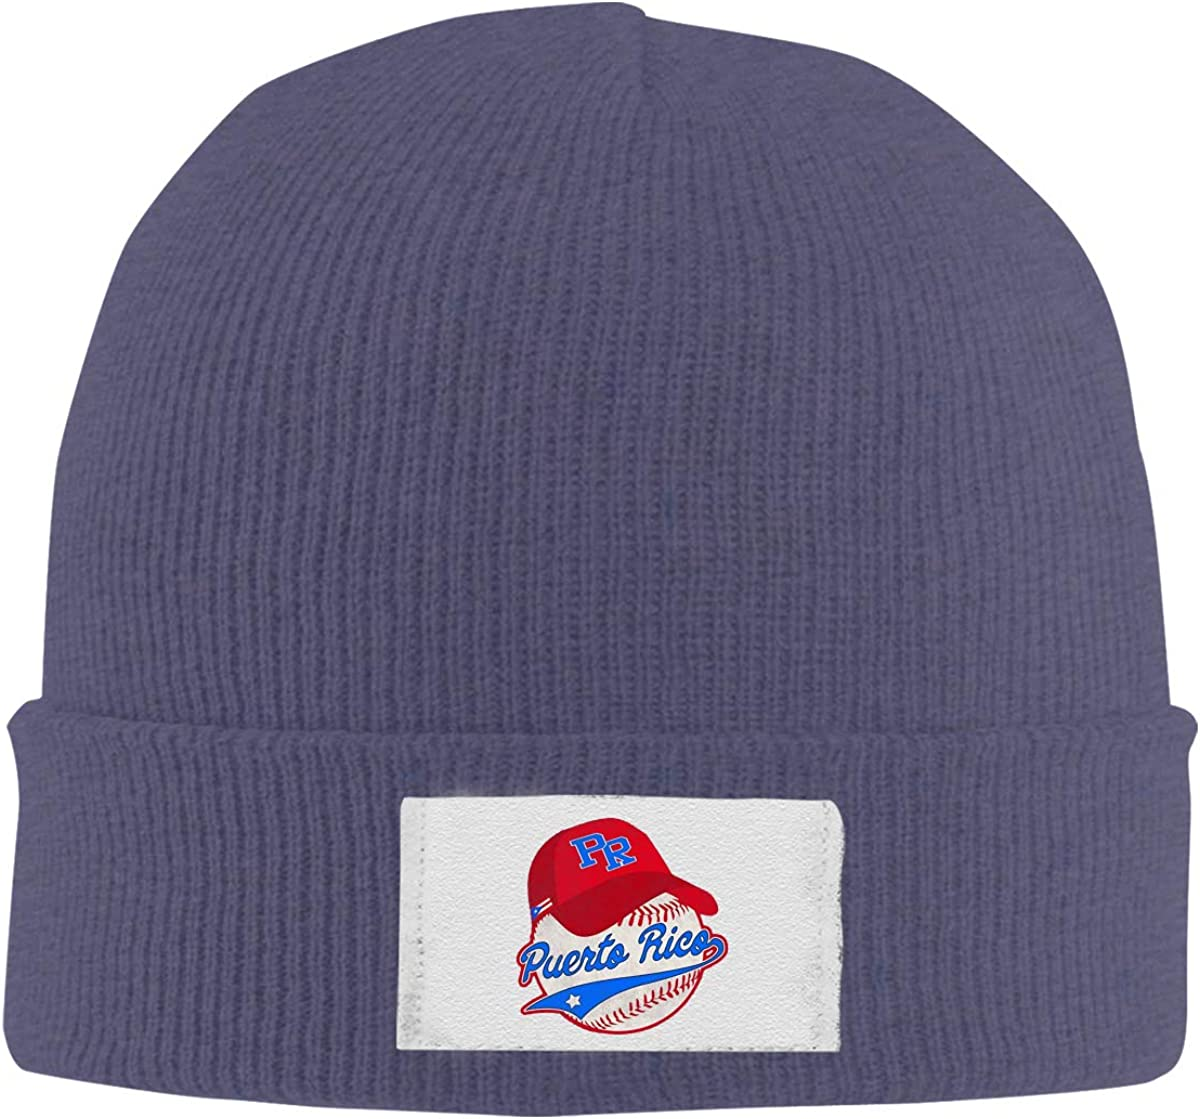 Stretchy Cuff Beanie Hat Black Skull Caps Puerto Rico Winter Warm Knit Hats